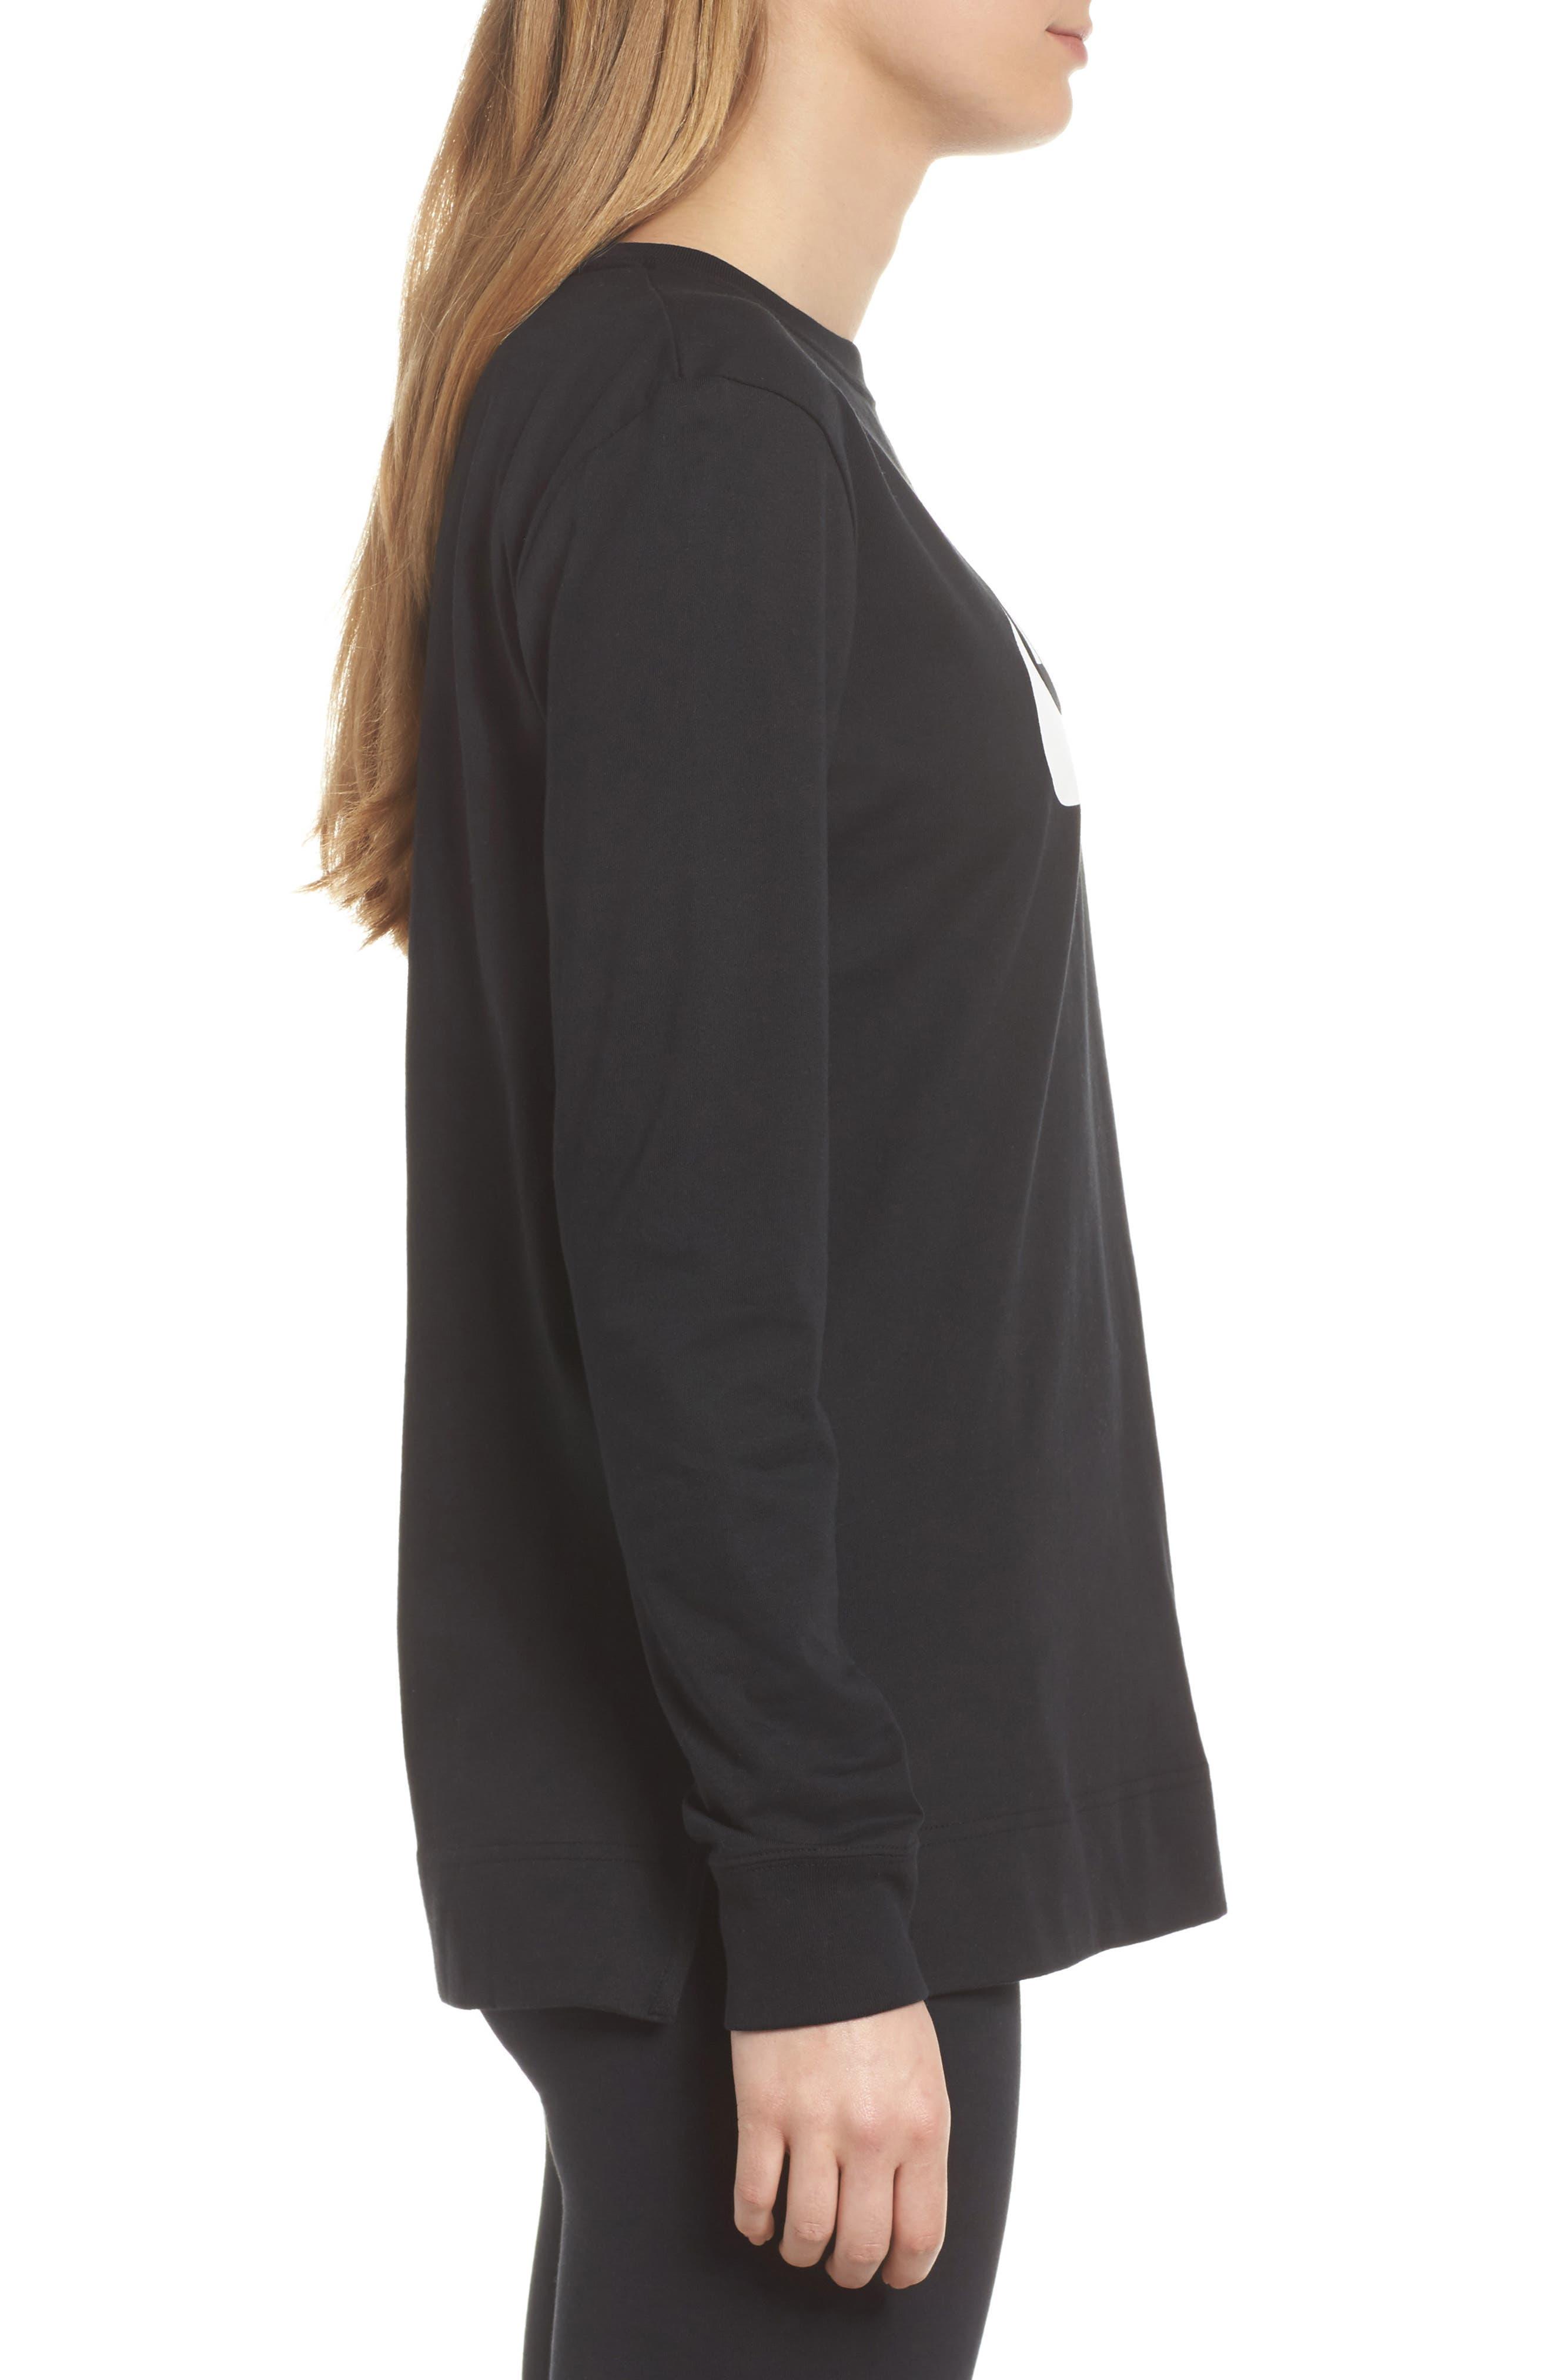 Sportswear HBR Women's Long Sleeve Tee,                             Alternate thumbnail 6, color,                             010